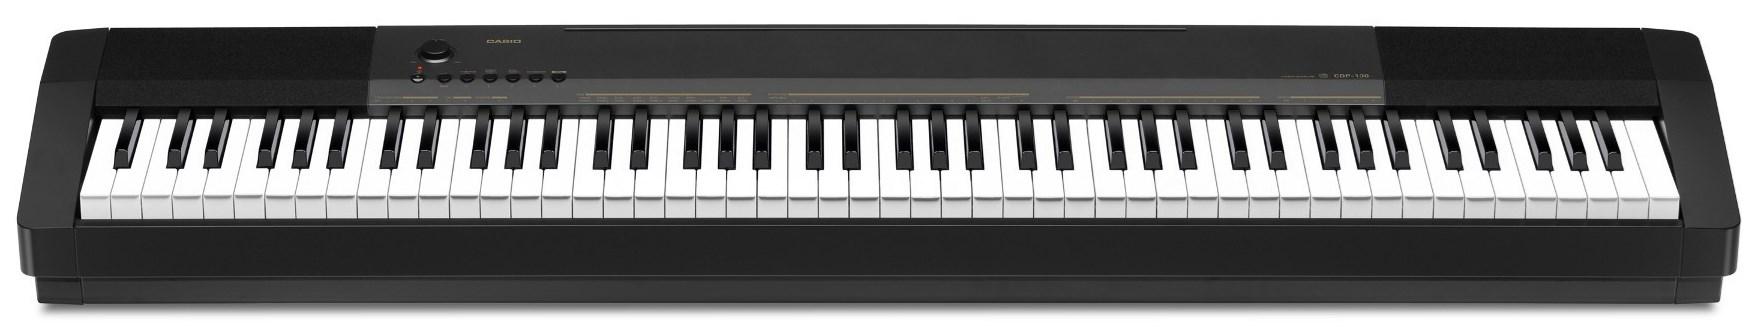 Casio CDP-130 Black Digital Piano